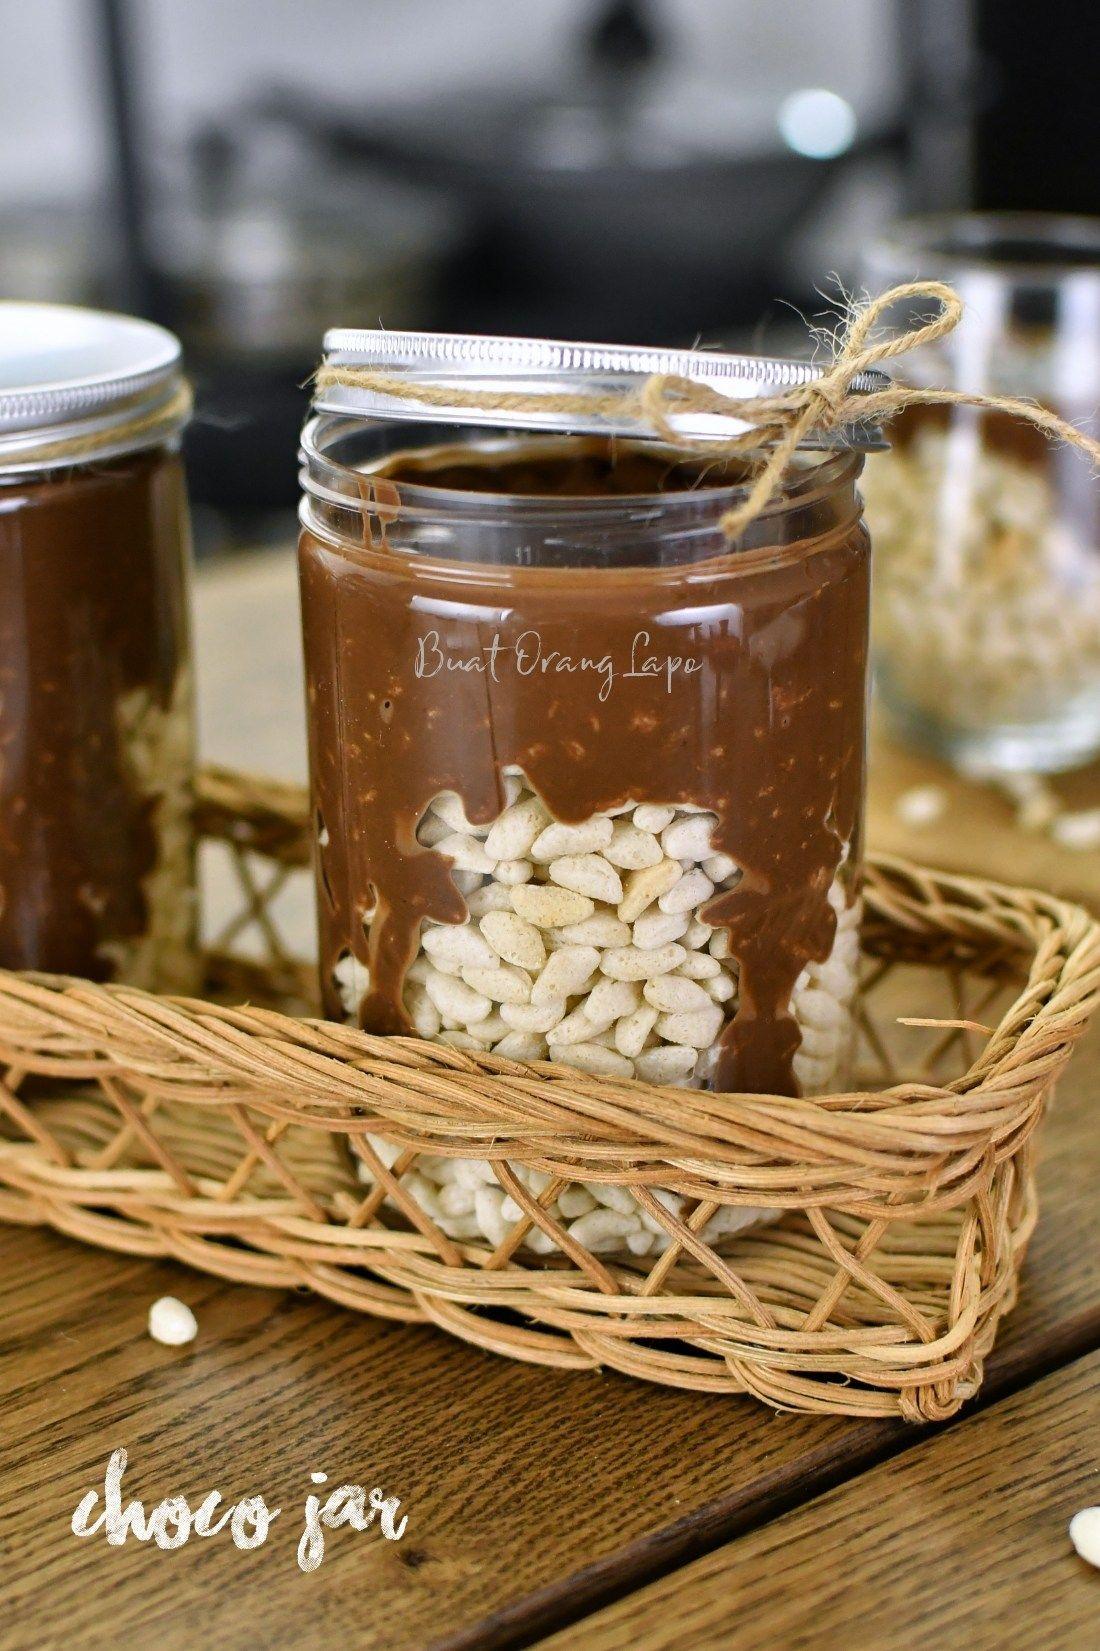 Hari Ni Saya Ingin Kongsikan Cara Untuk Membuat Choco Jar Yang Viral Sejak Kebelakangan Ni Sebenarnya Resepi Ni Memang Senang Sangat Choco Jar Jar Choco